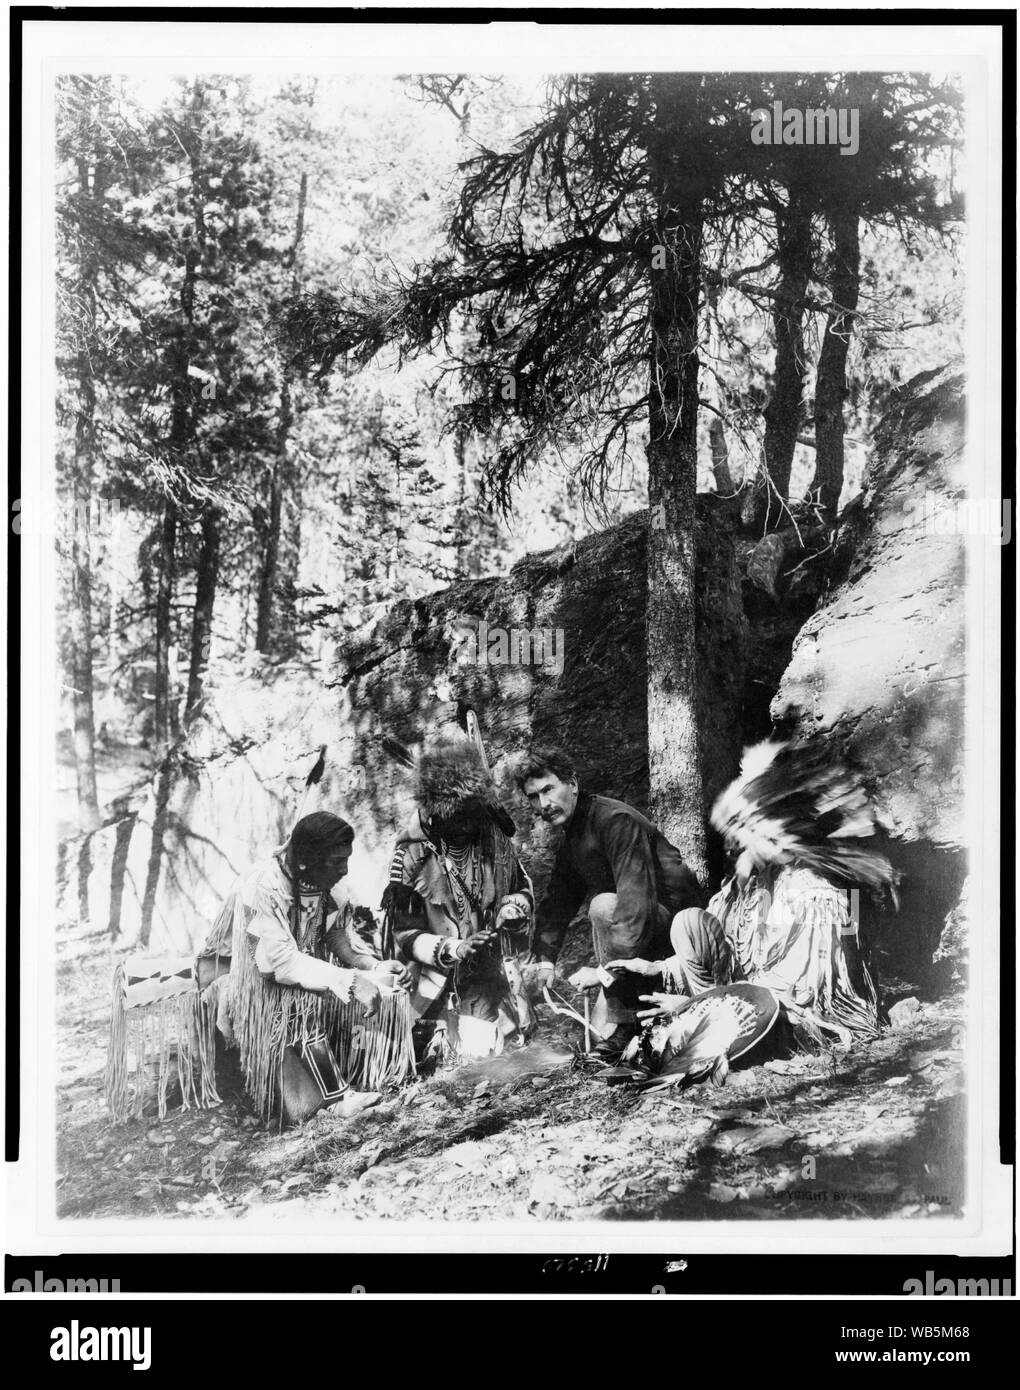 Blackfoot incontri